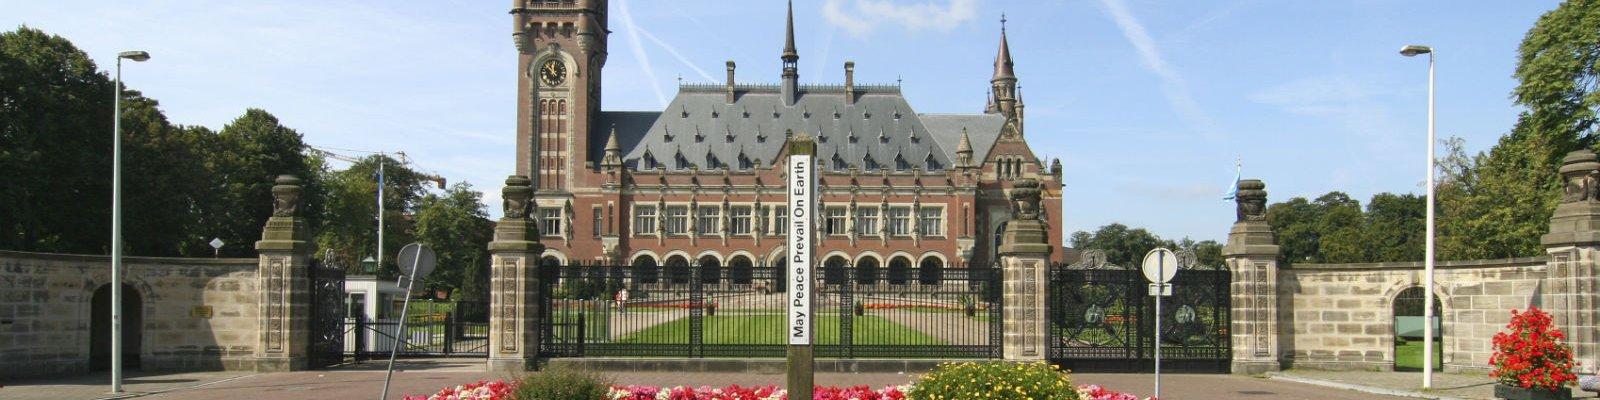 UCILS - Peace Palace, The Hague